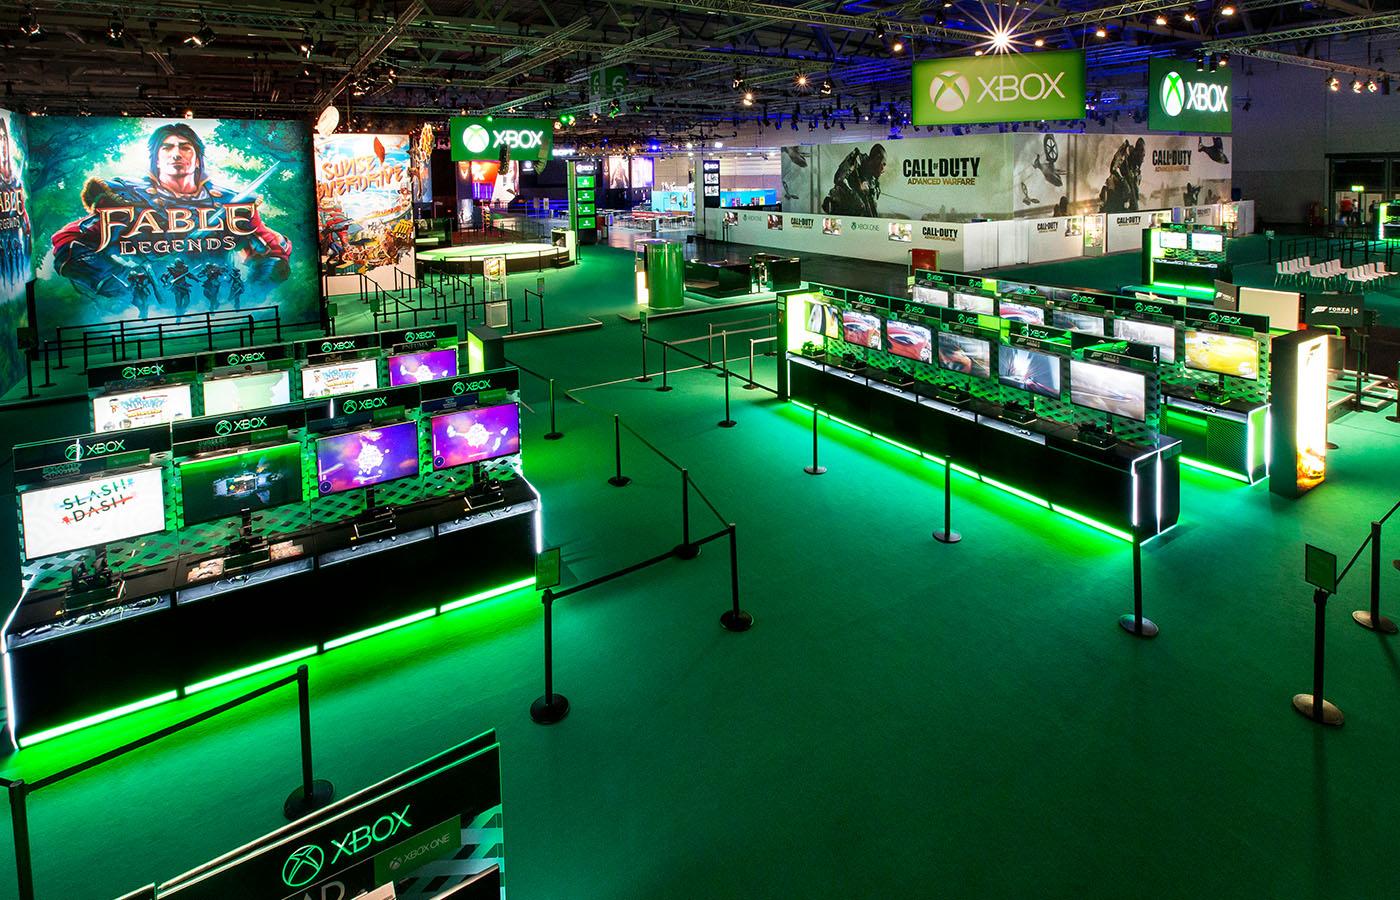 Gamescom Xbox Booth 2017